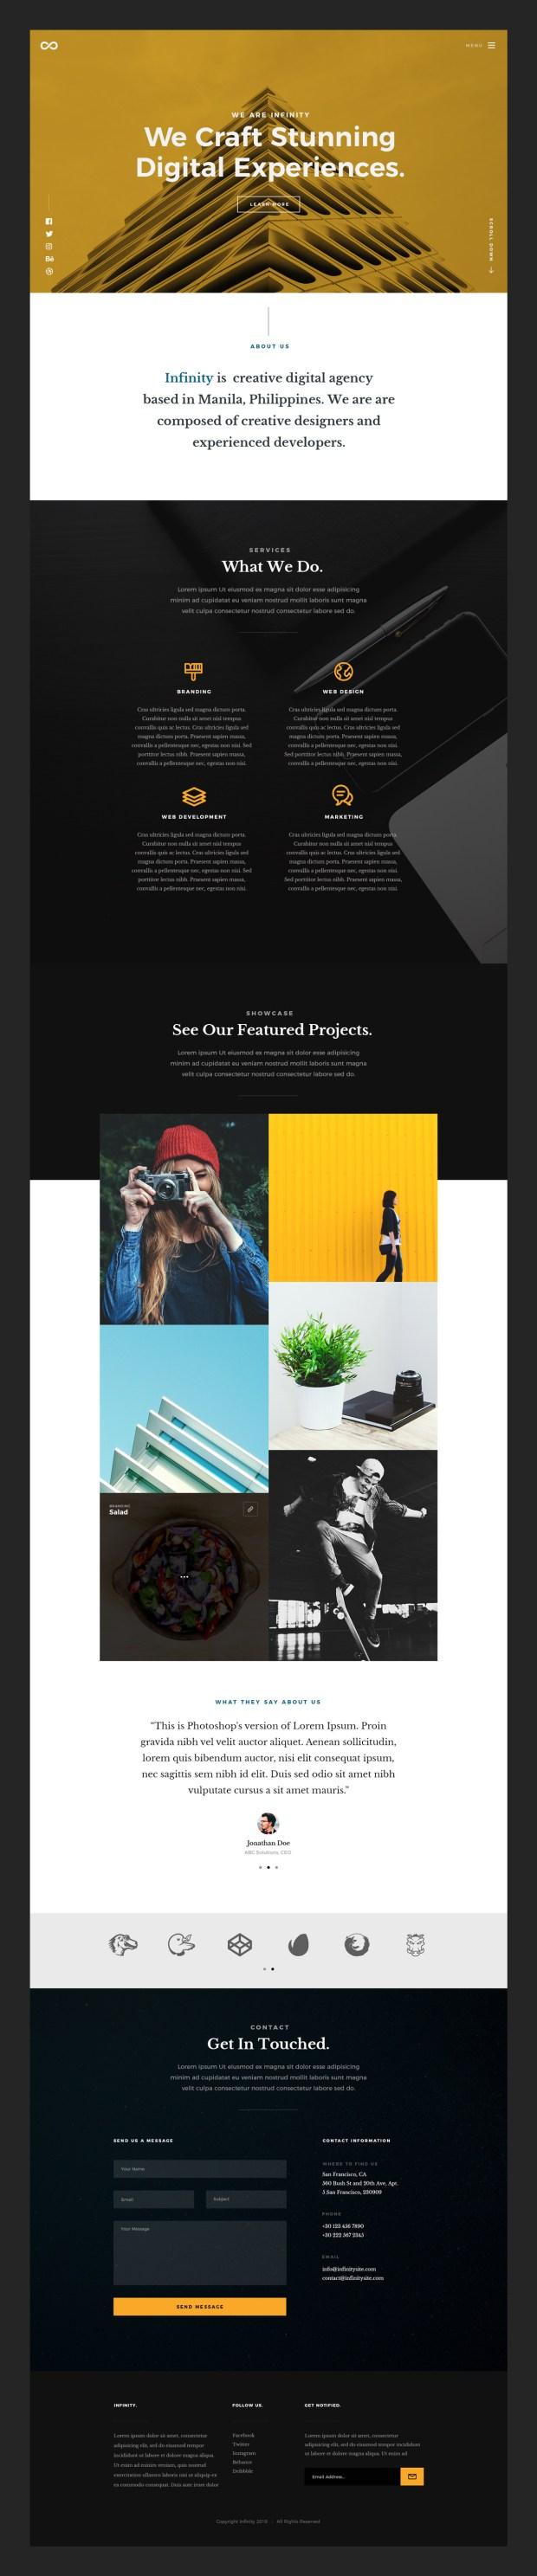 Infinity - Agency Portfolio Free PSD Website Template 02